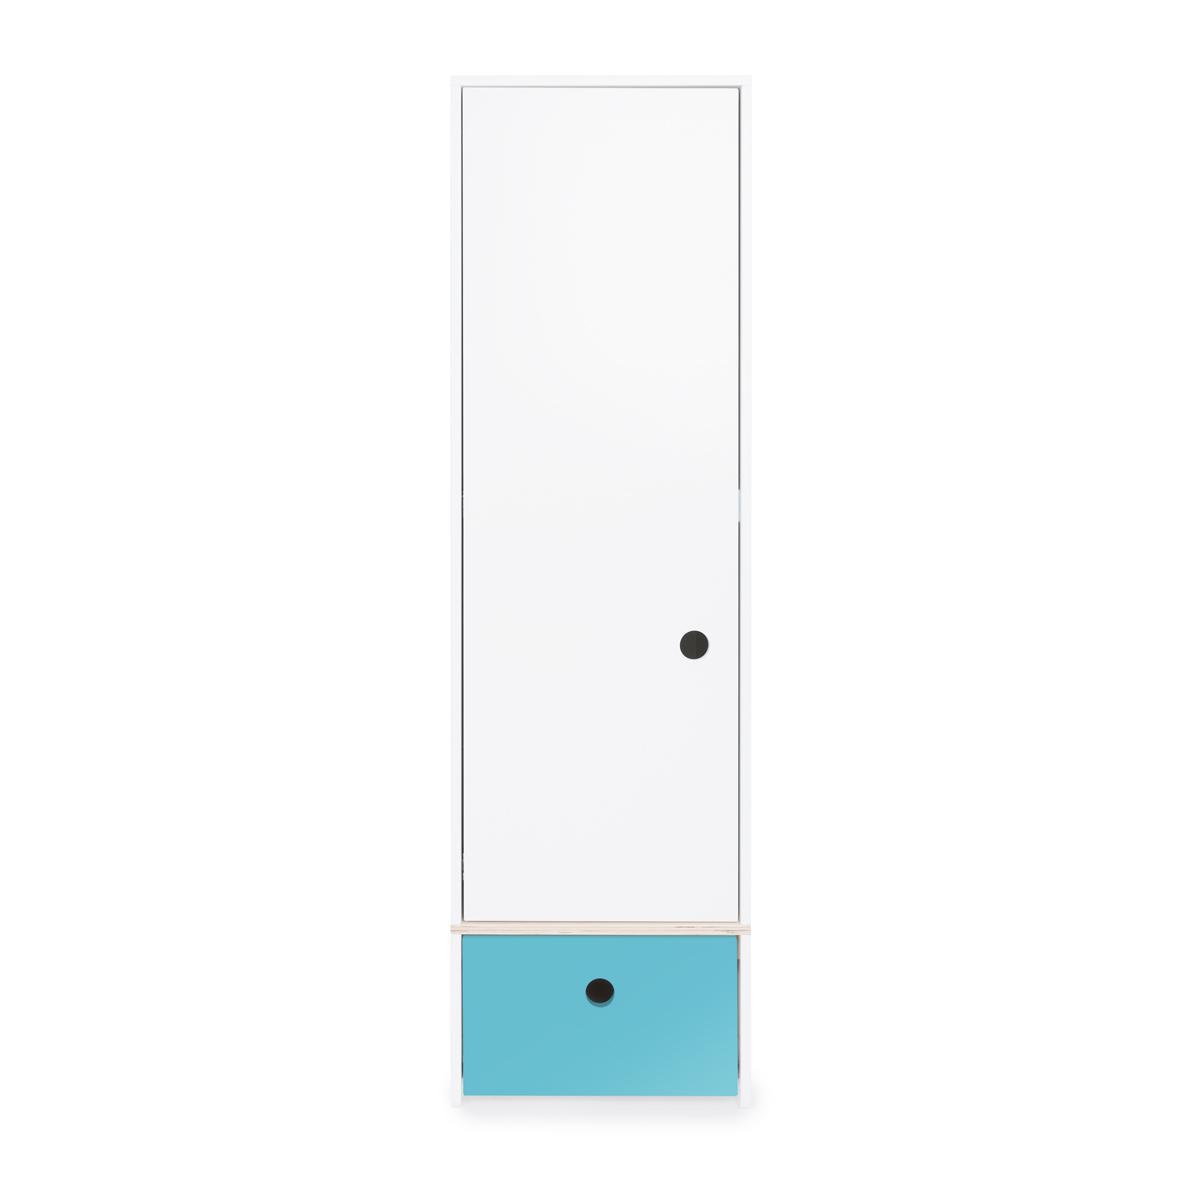 Armoire 1 porte COLORFLEX façade tiroir paradise blue